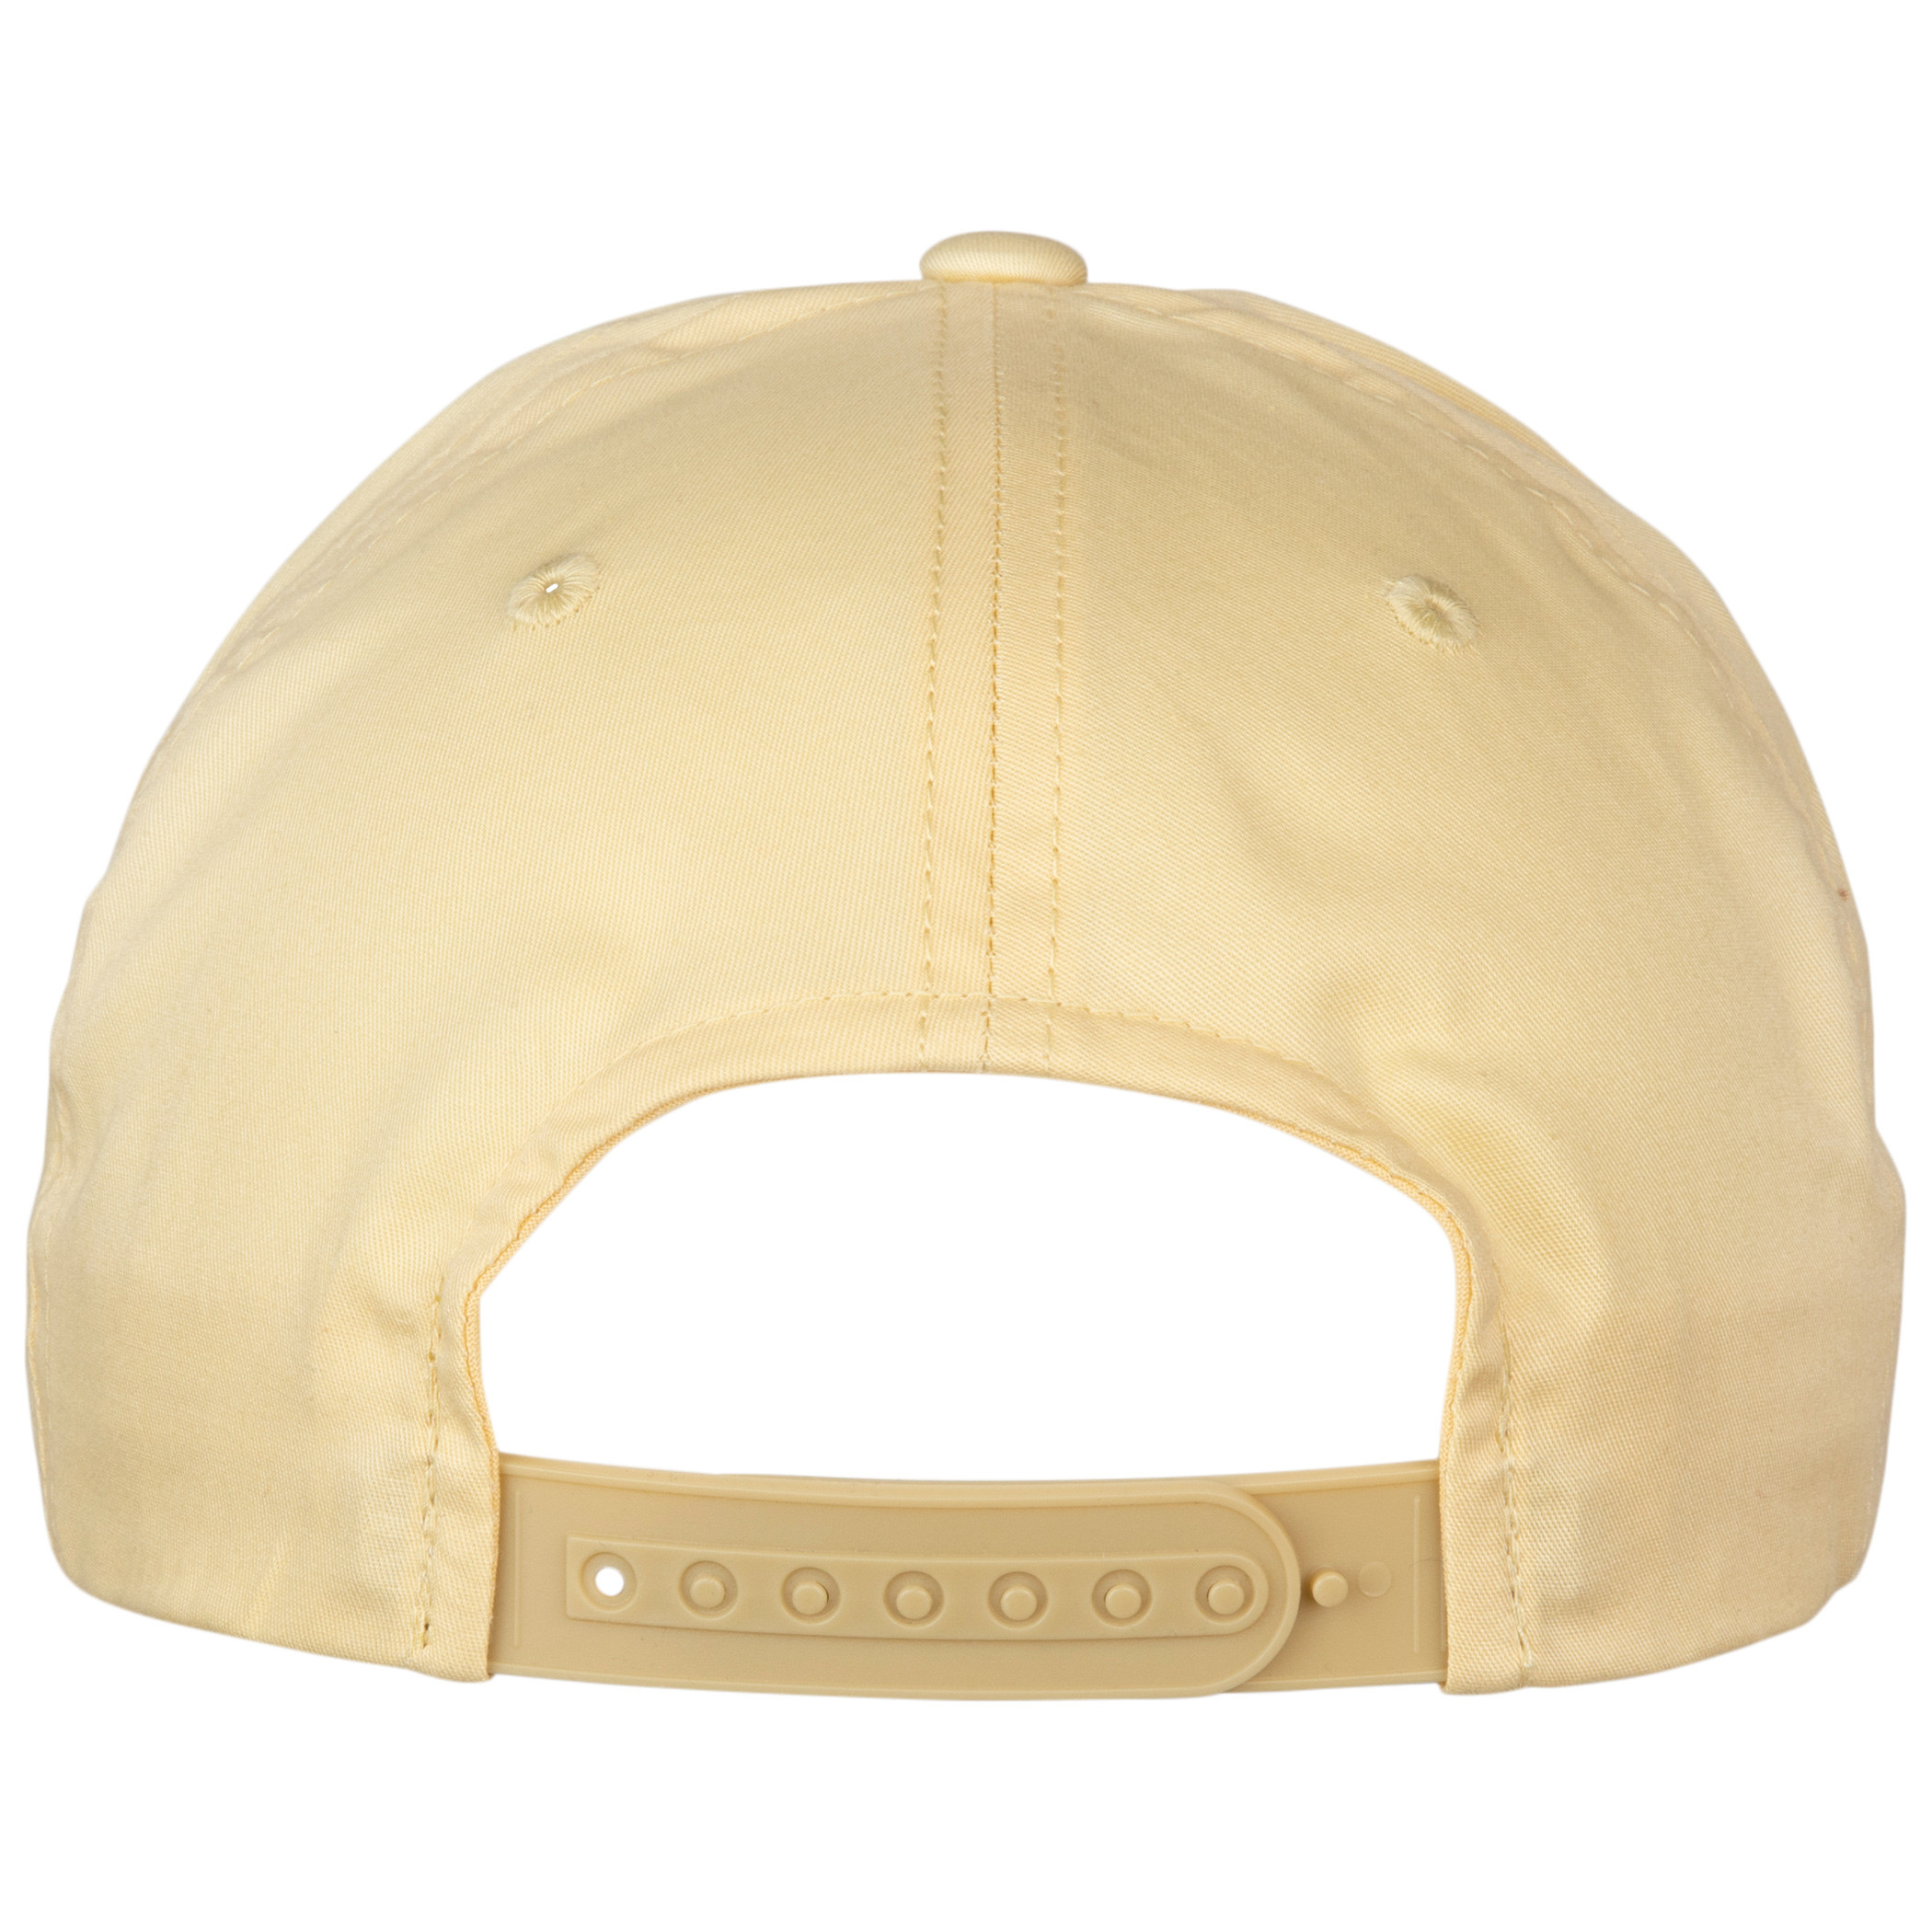 Blatz Beer Roped Brim Adjustable Snapback Hat